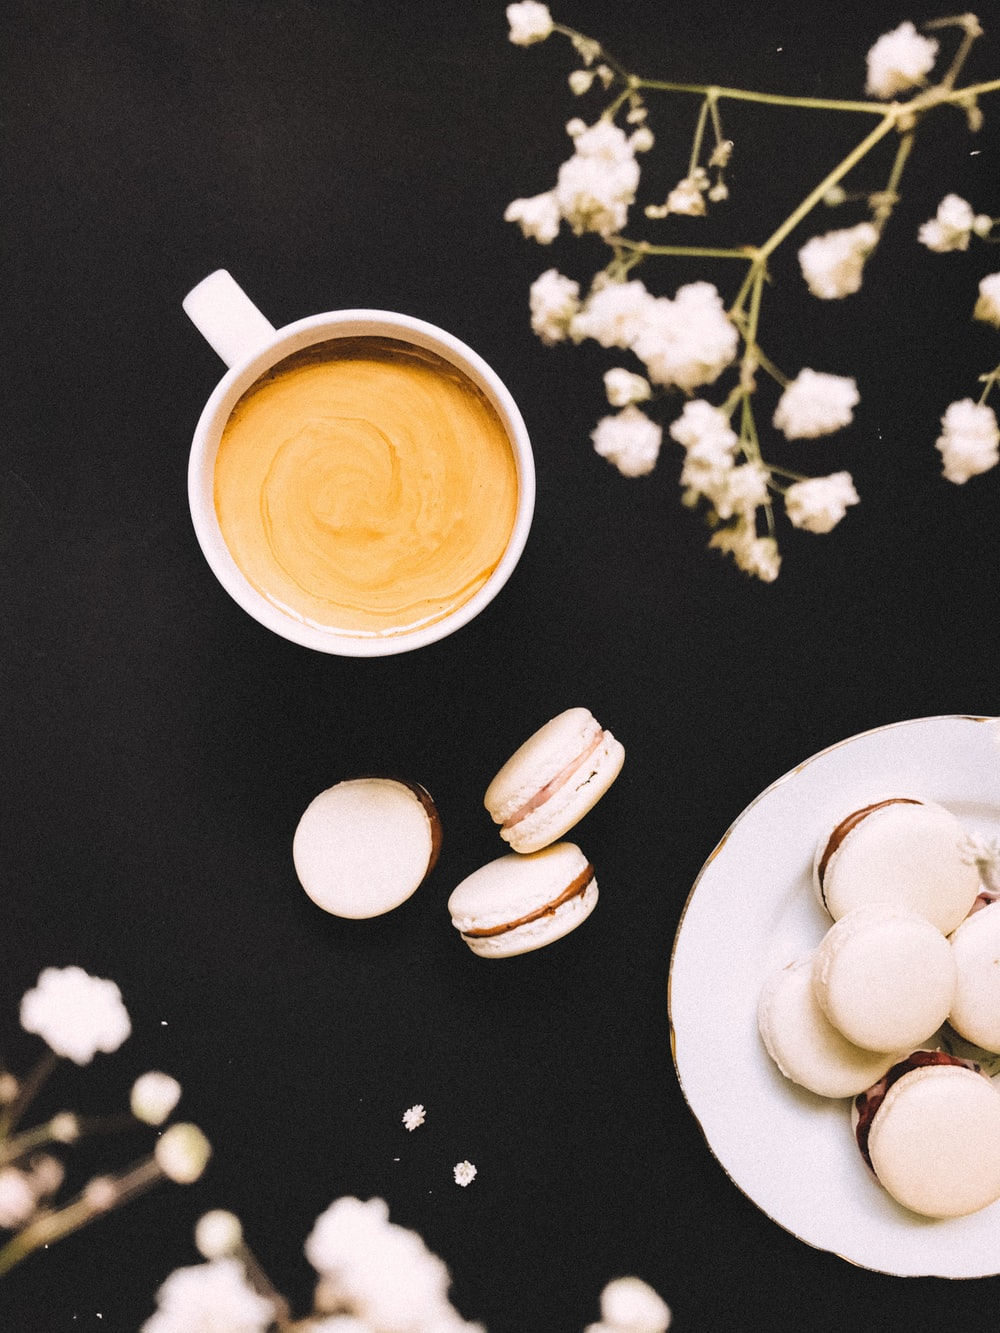 white ceramic mug with coffee on white ceramic saucer